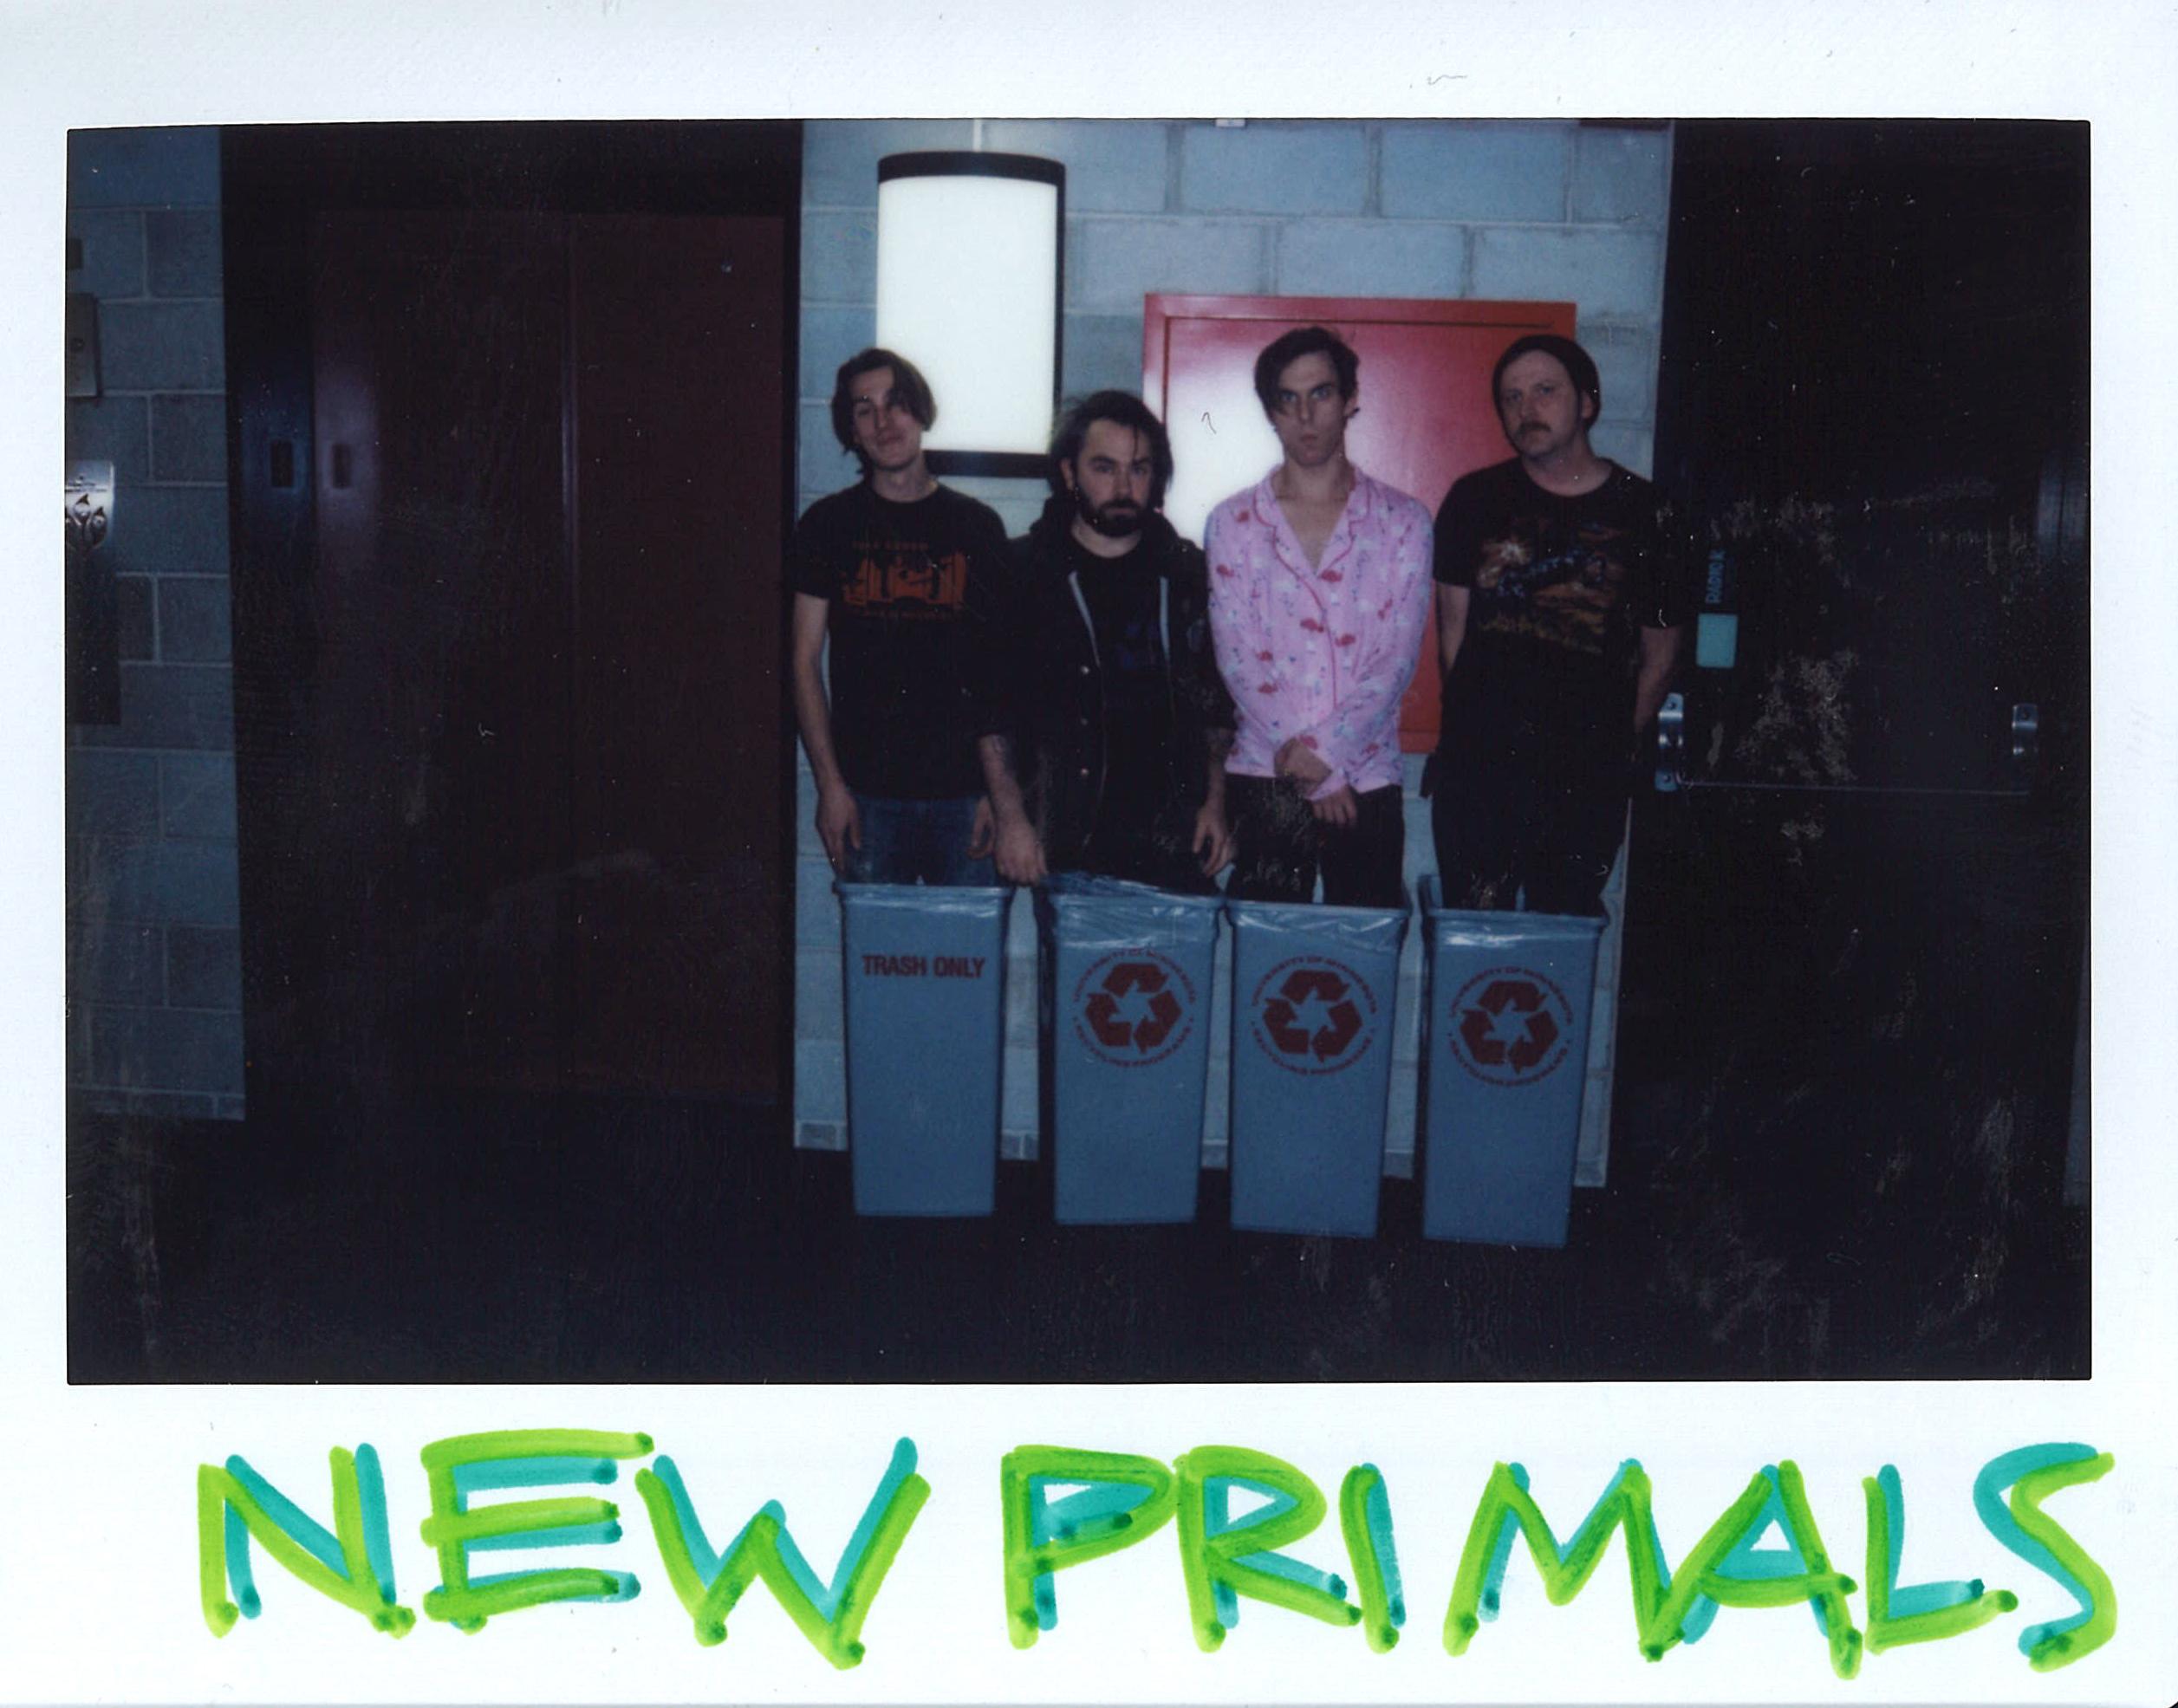 New Primals